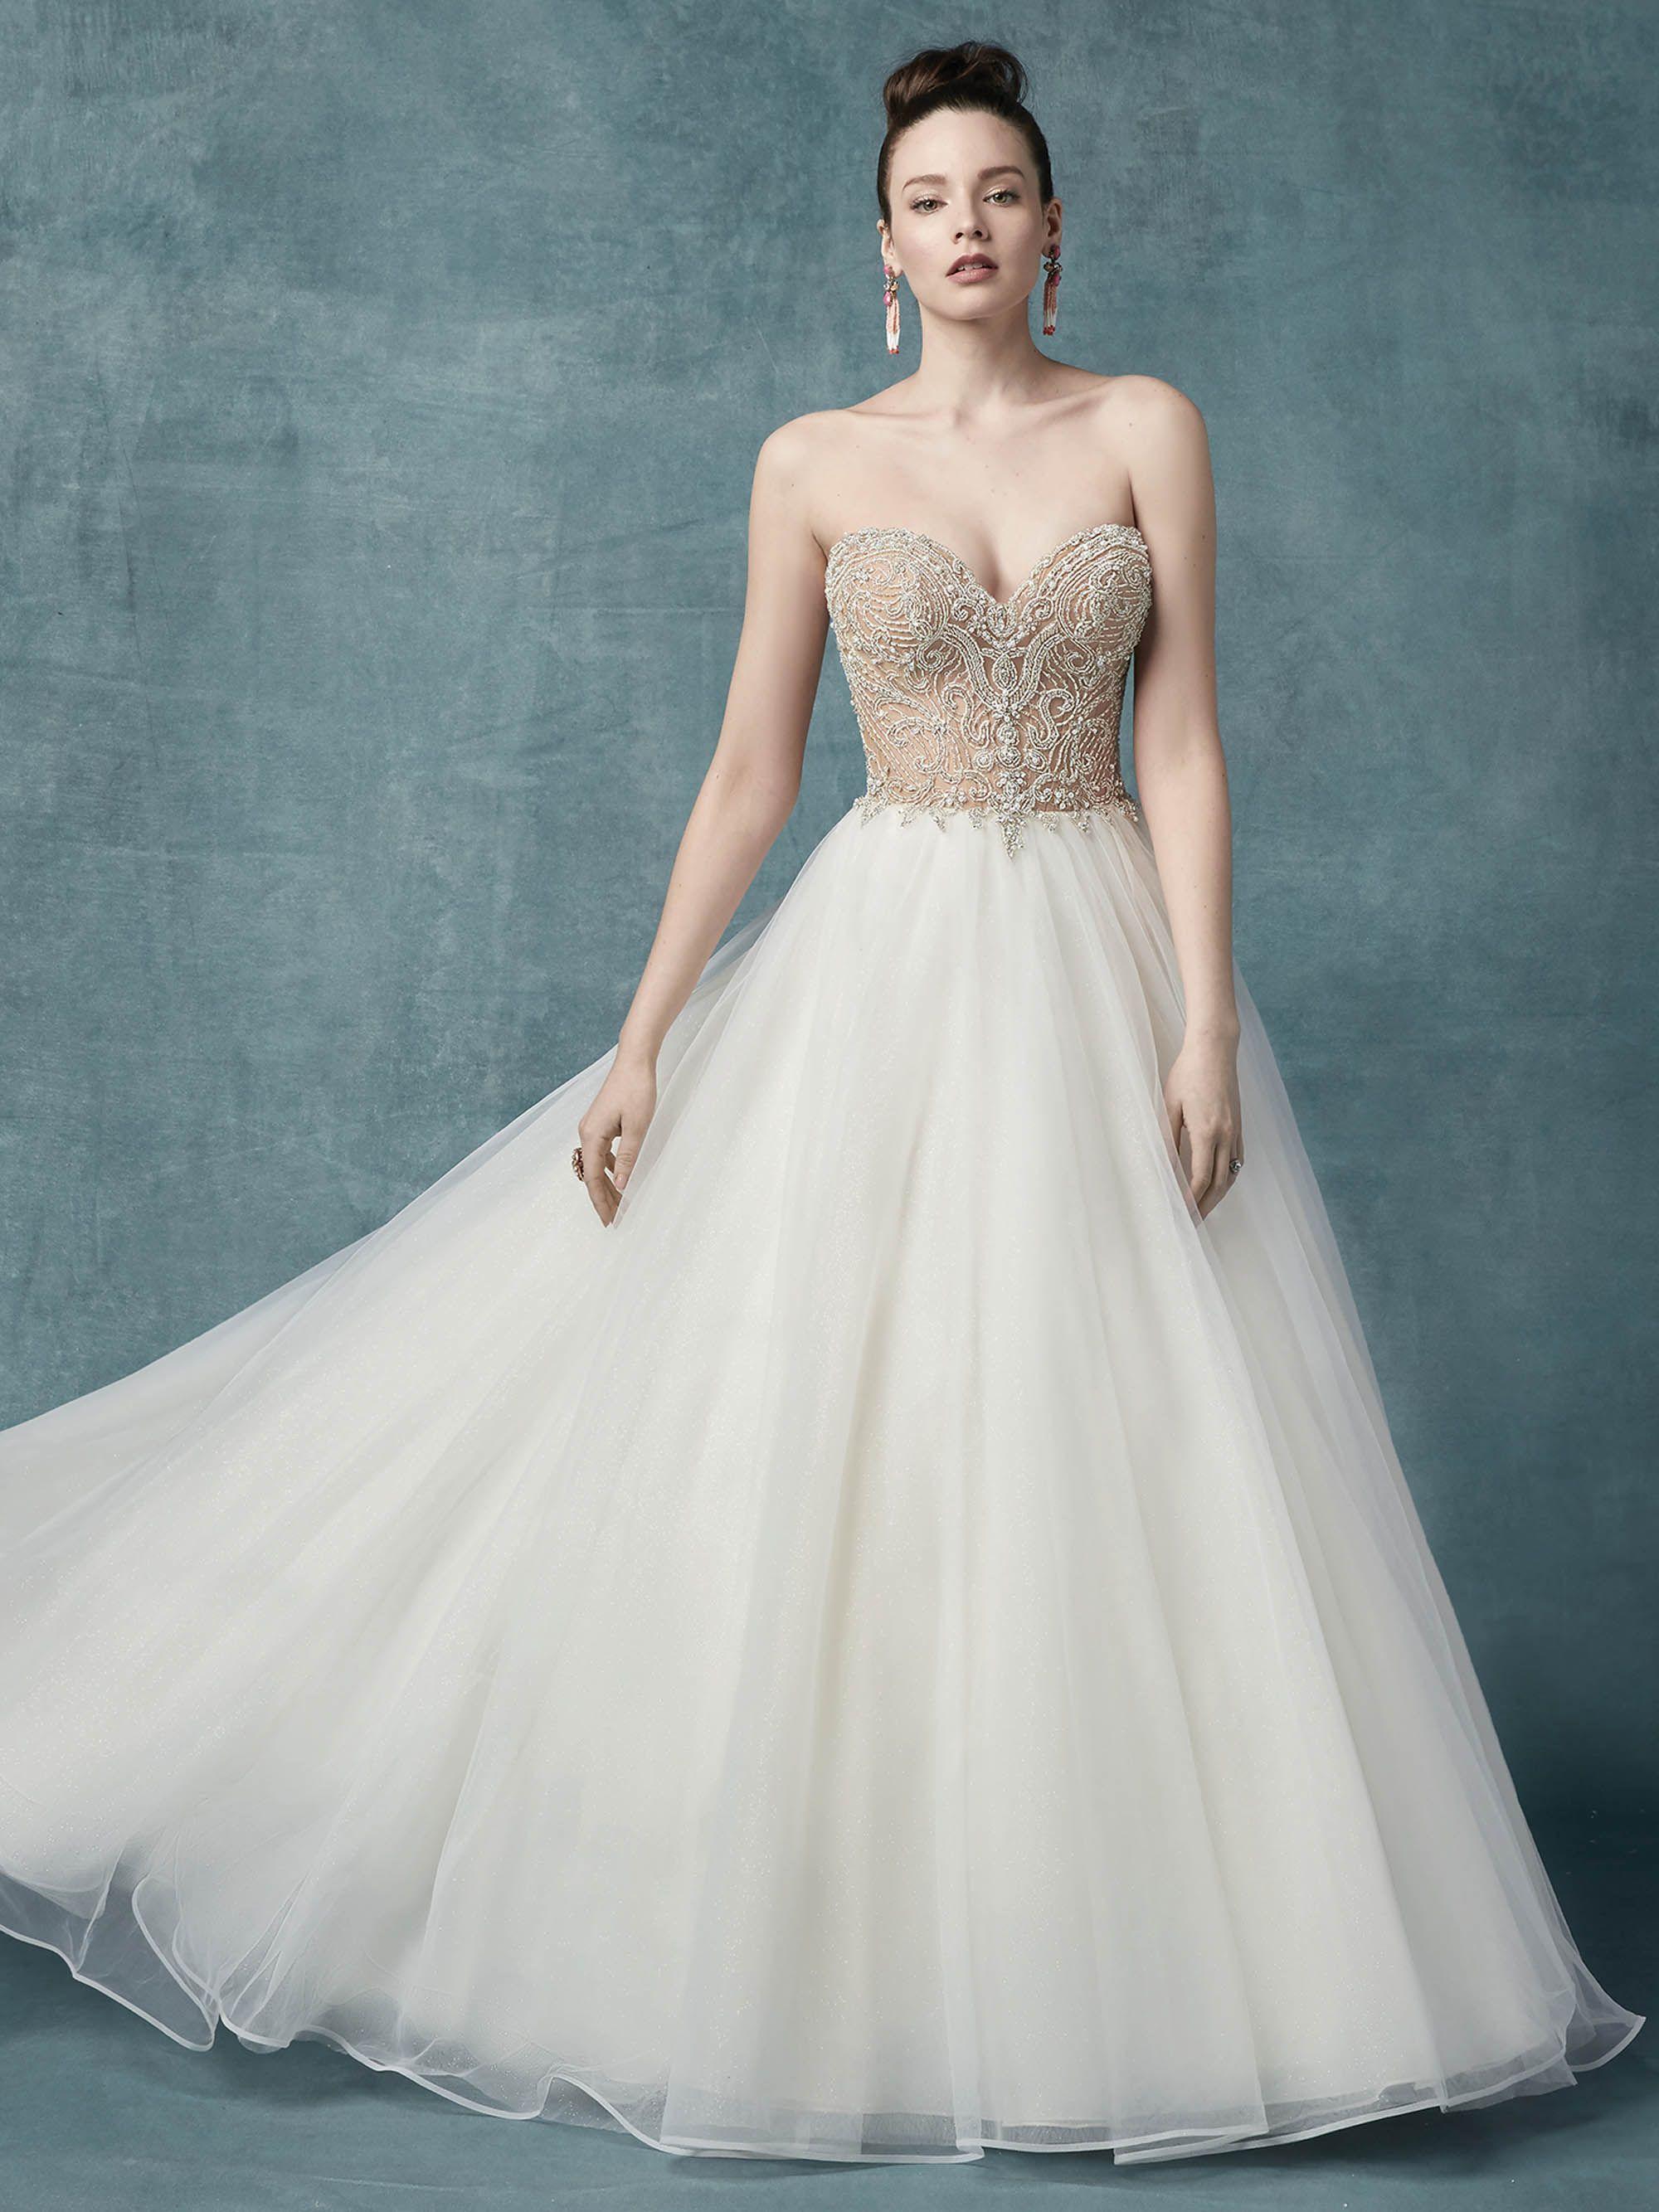 0f6e90cba4da2 Vera Wang Wedding Dresses Northern Ireland